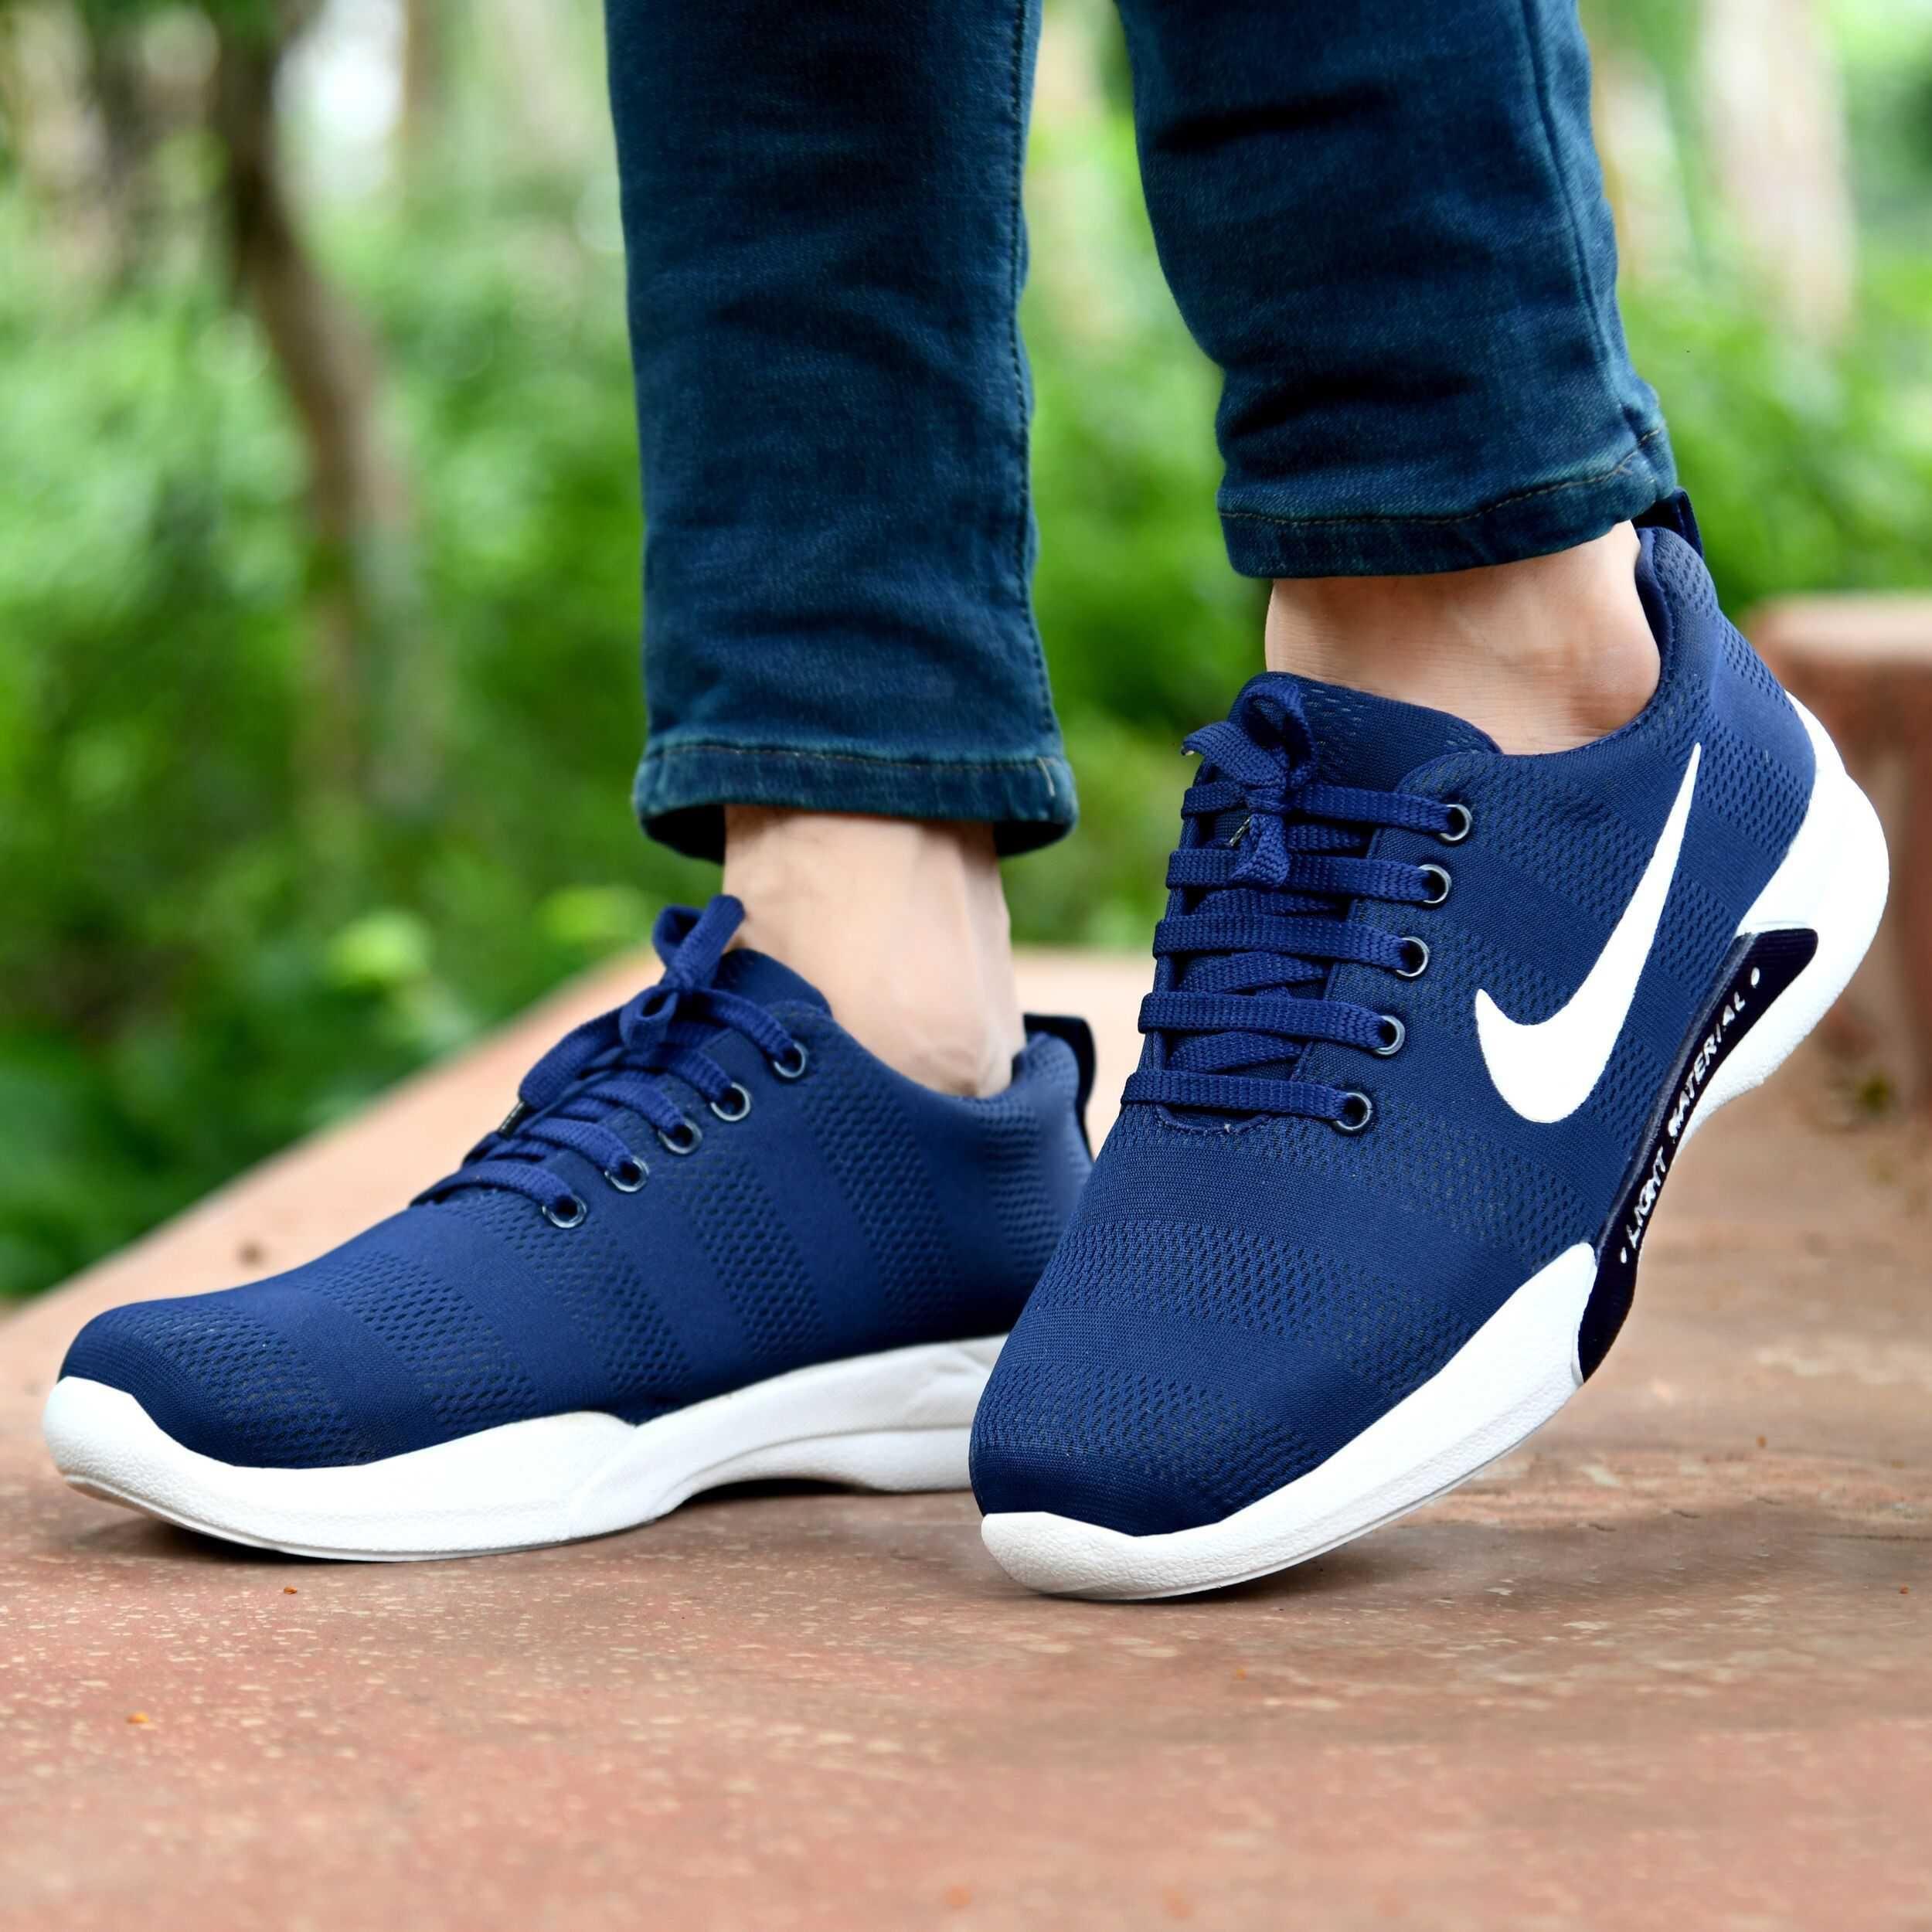 Men's Sports Shoe